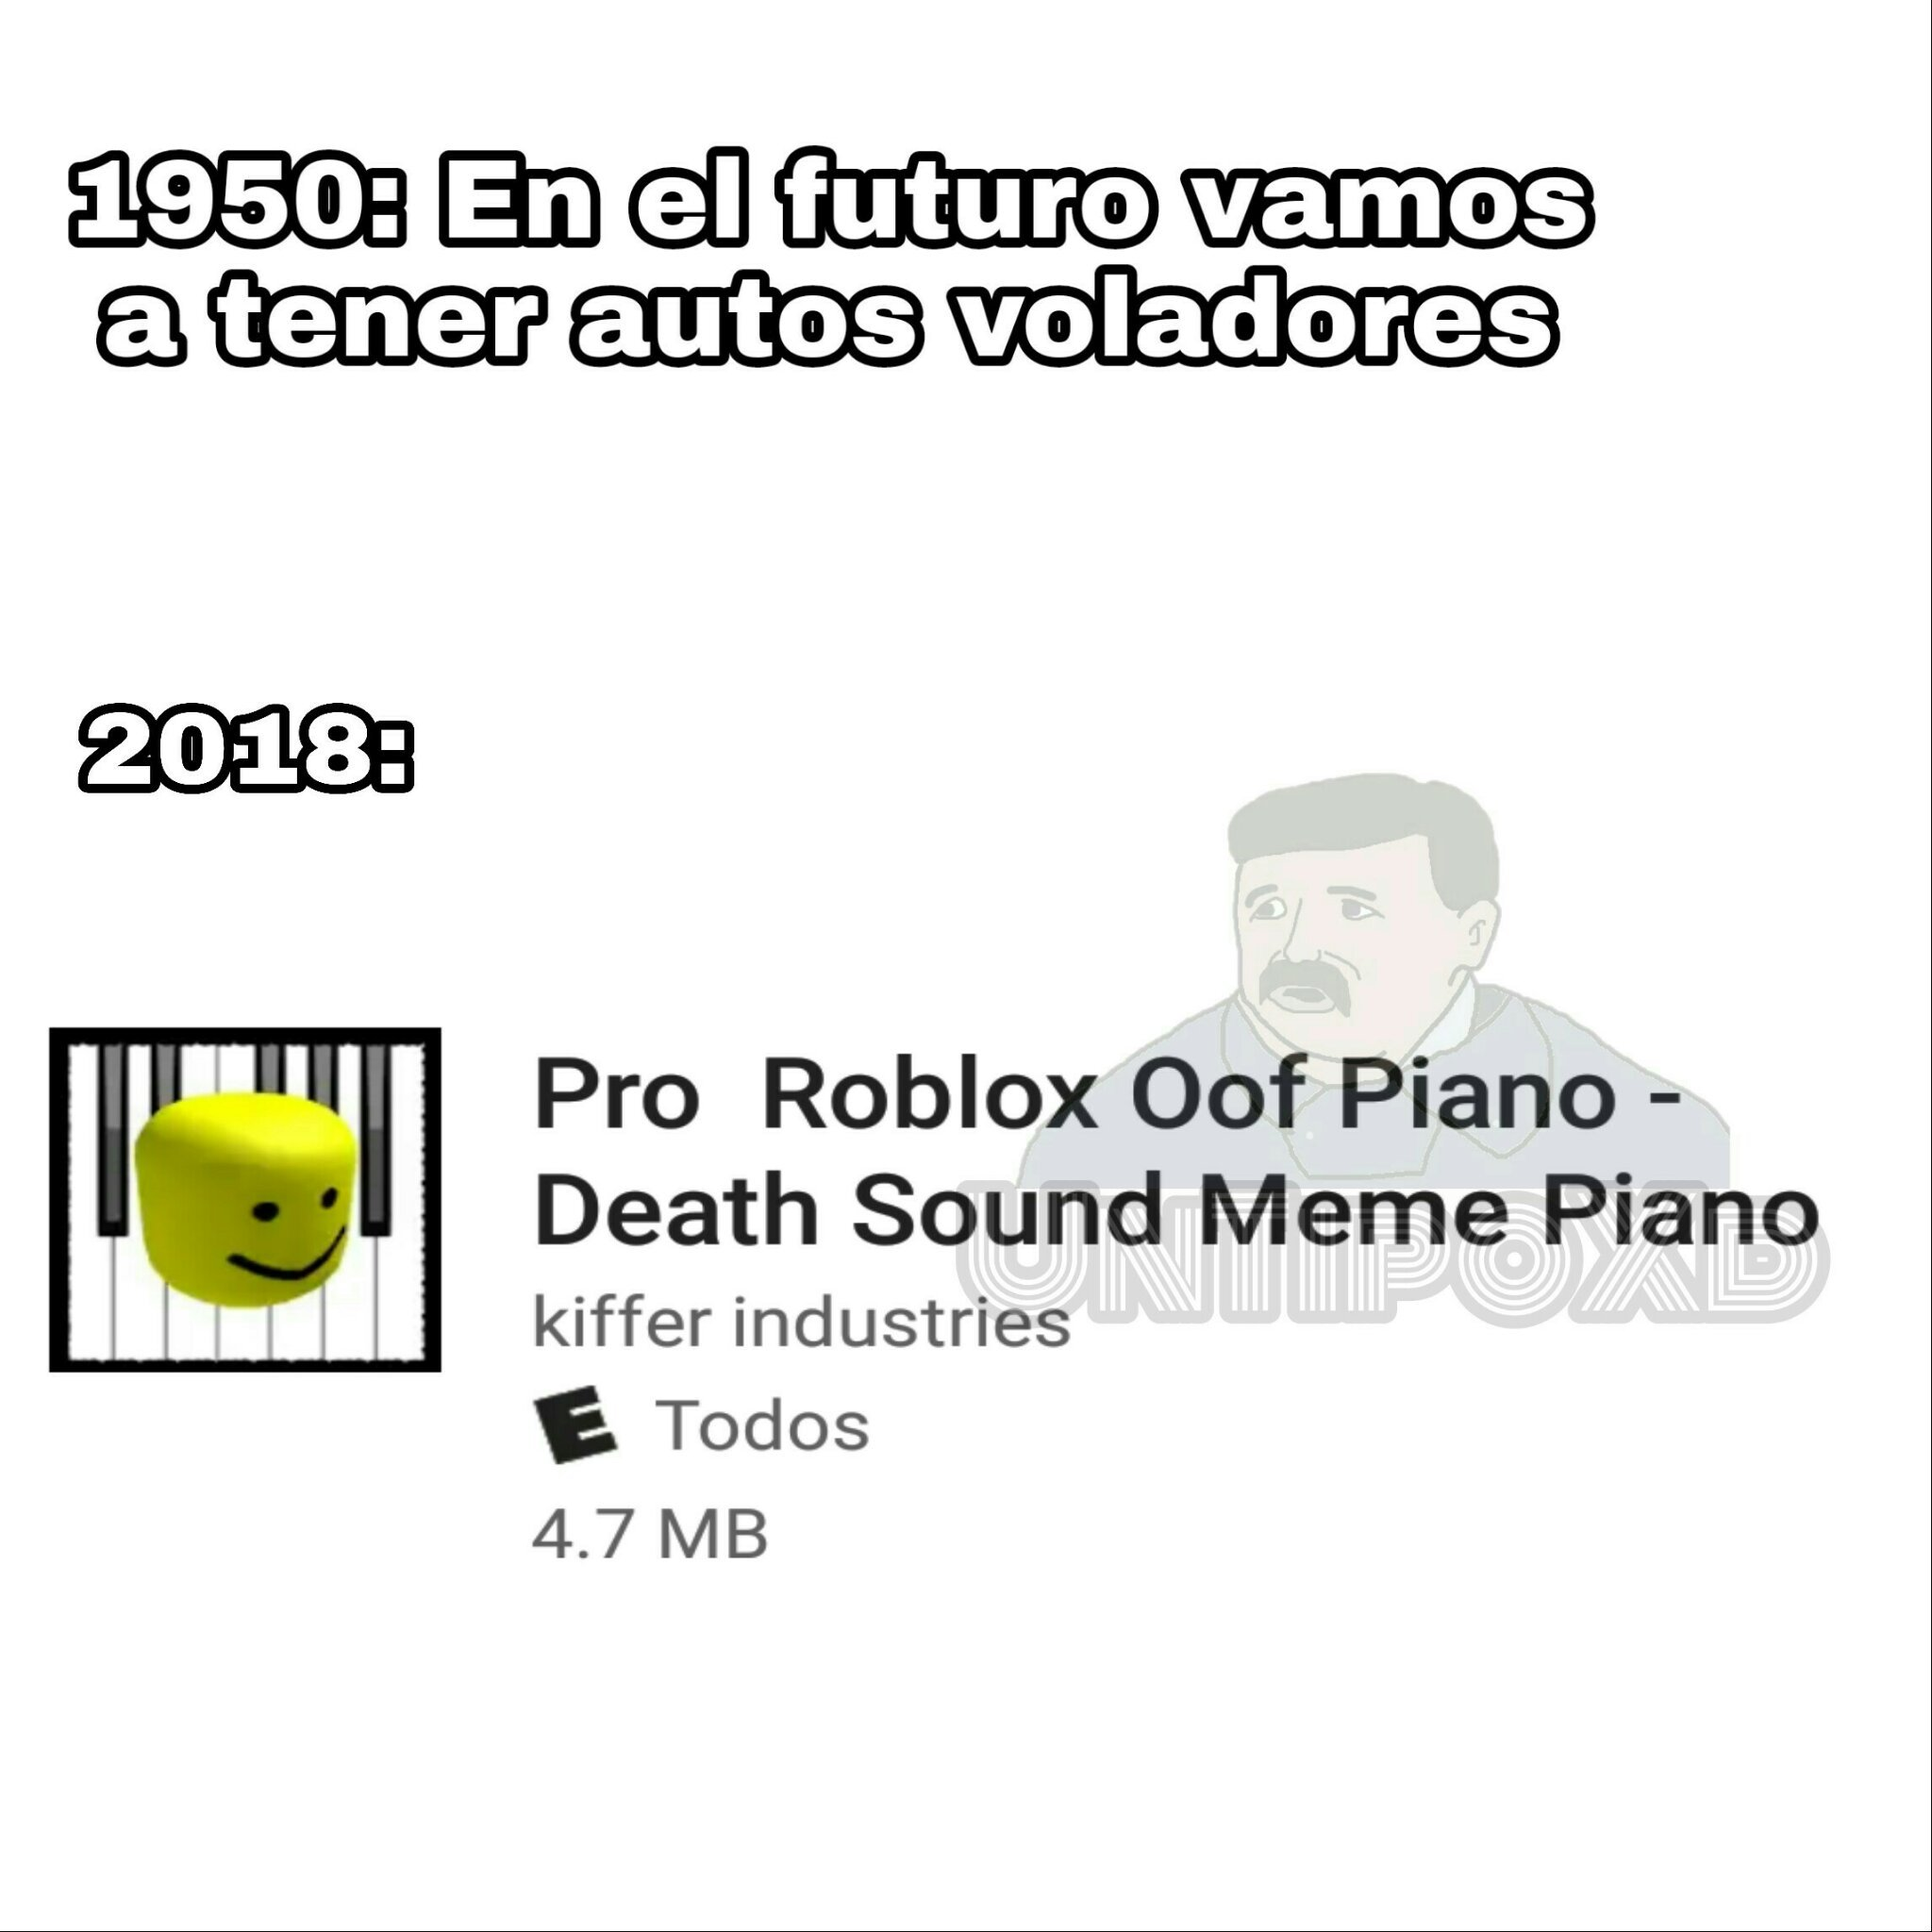 (İnsertar Título) - meme